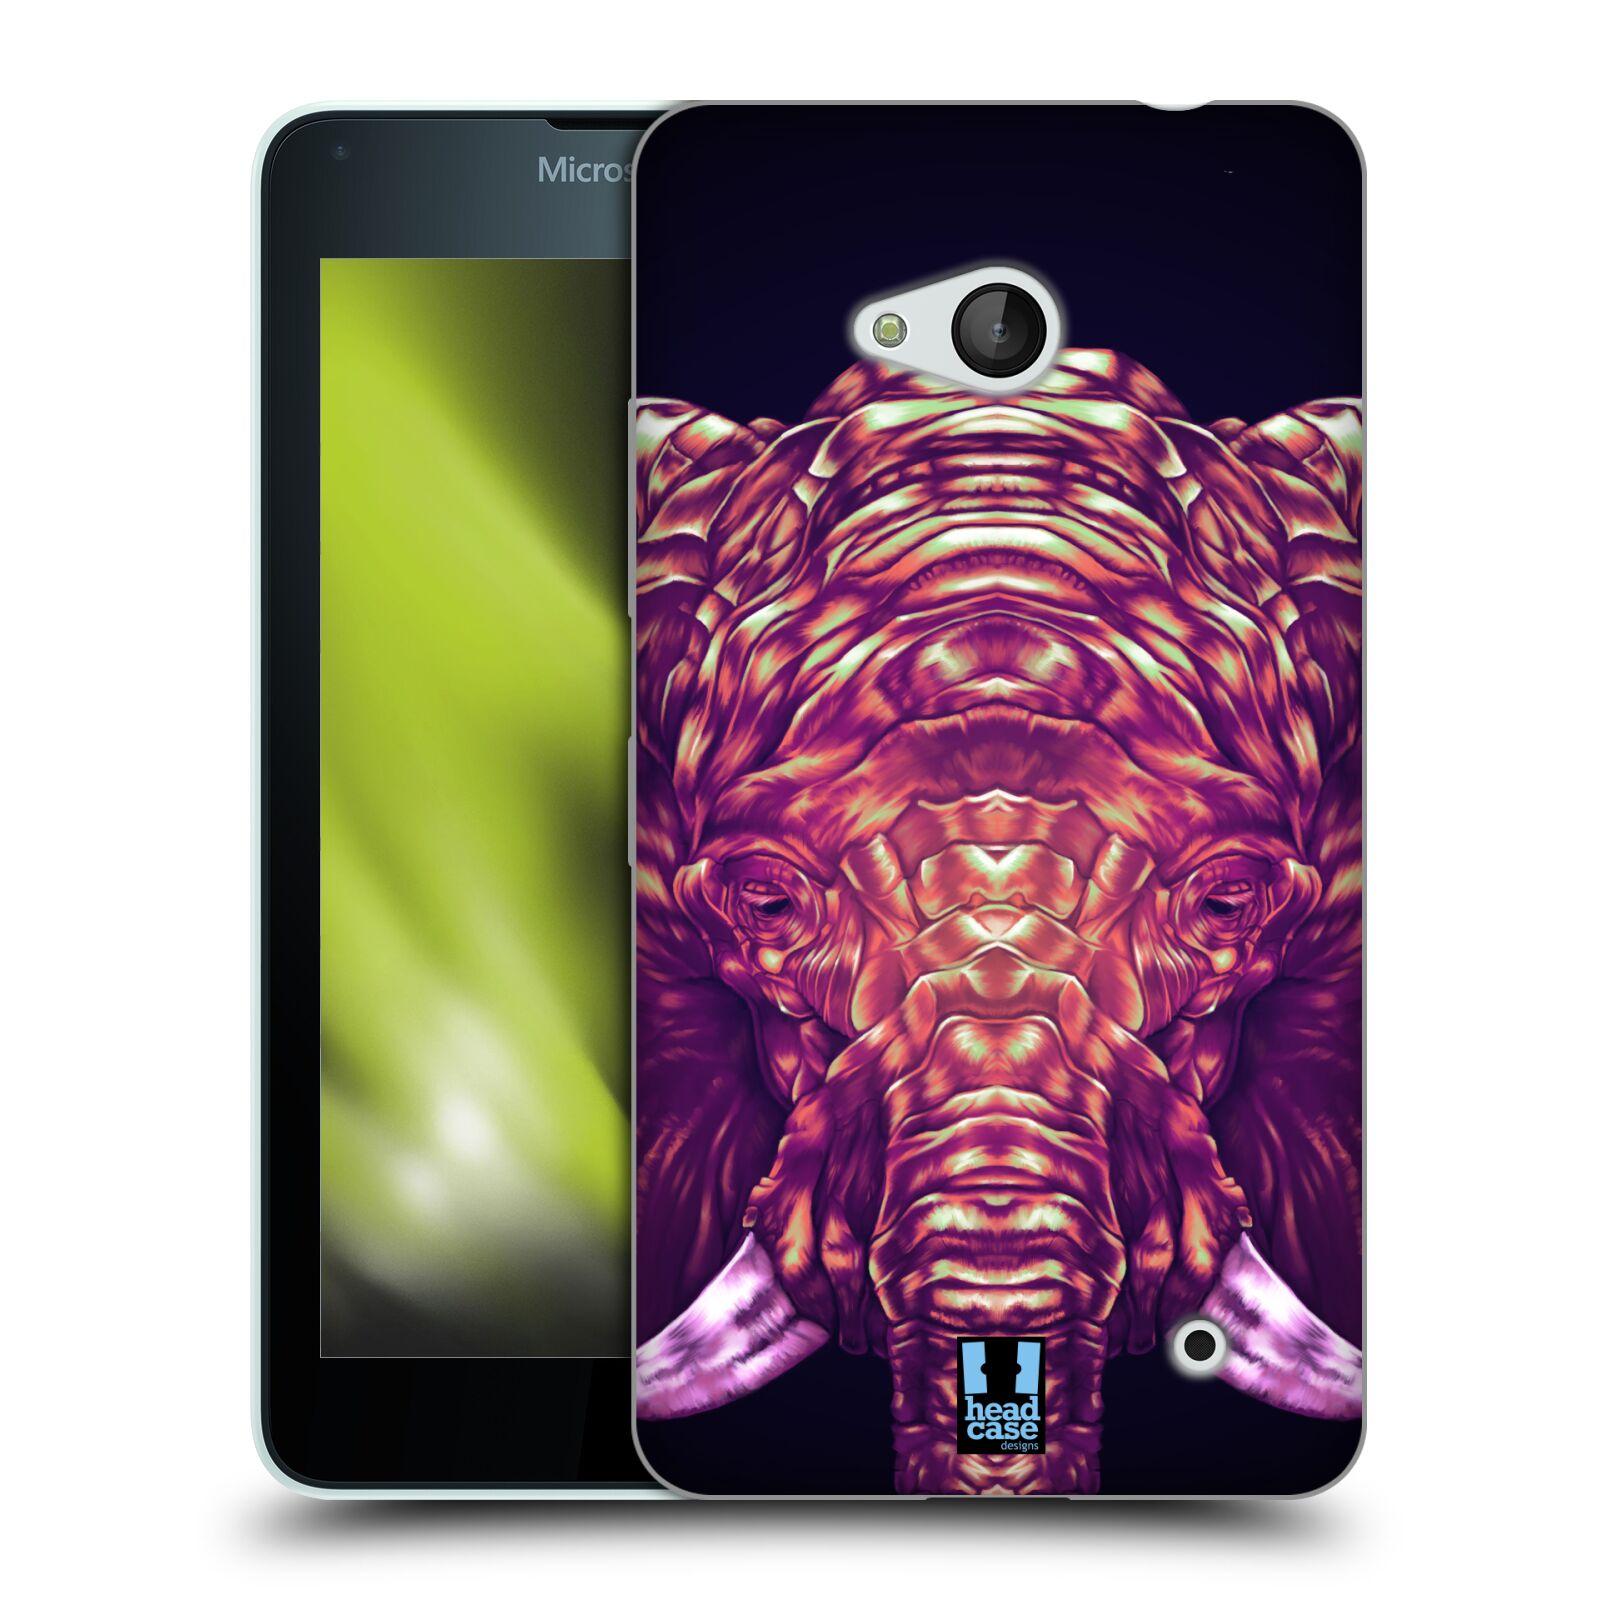 HEAD-CASE-DESIGNS-ULTRAVIOLET-ANIMALS-SOFT-GEL-CASE-FOR-NOKIA-PHONES-2